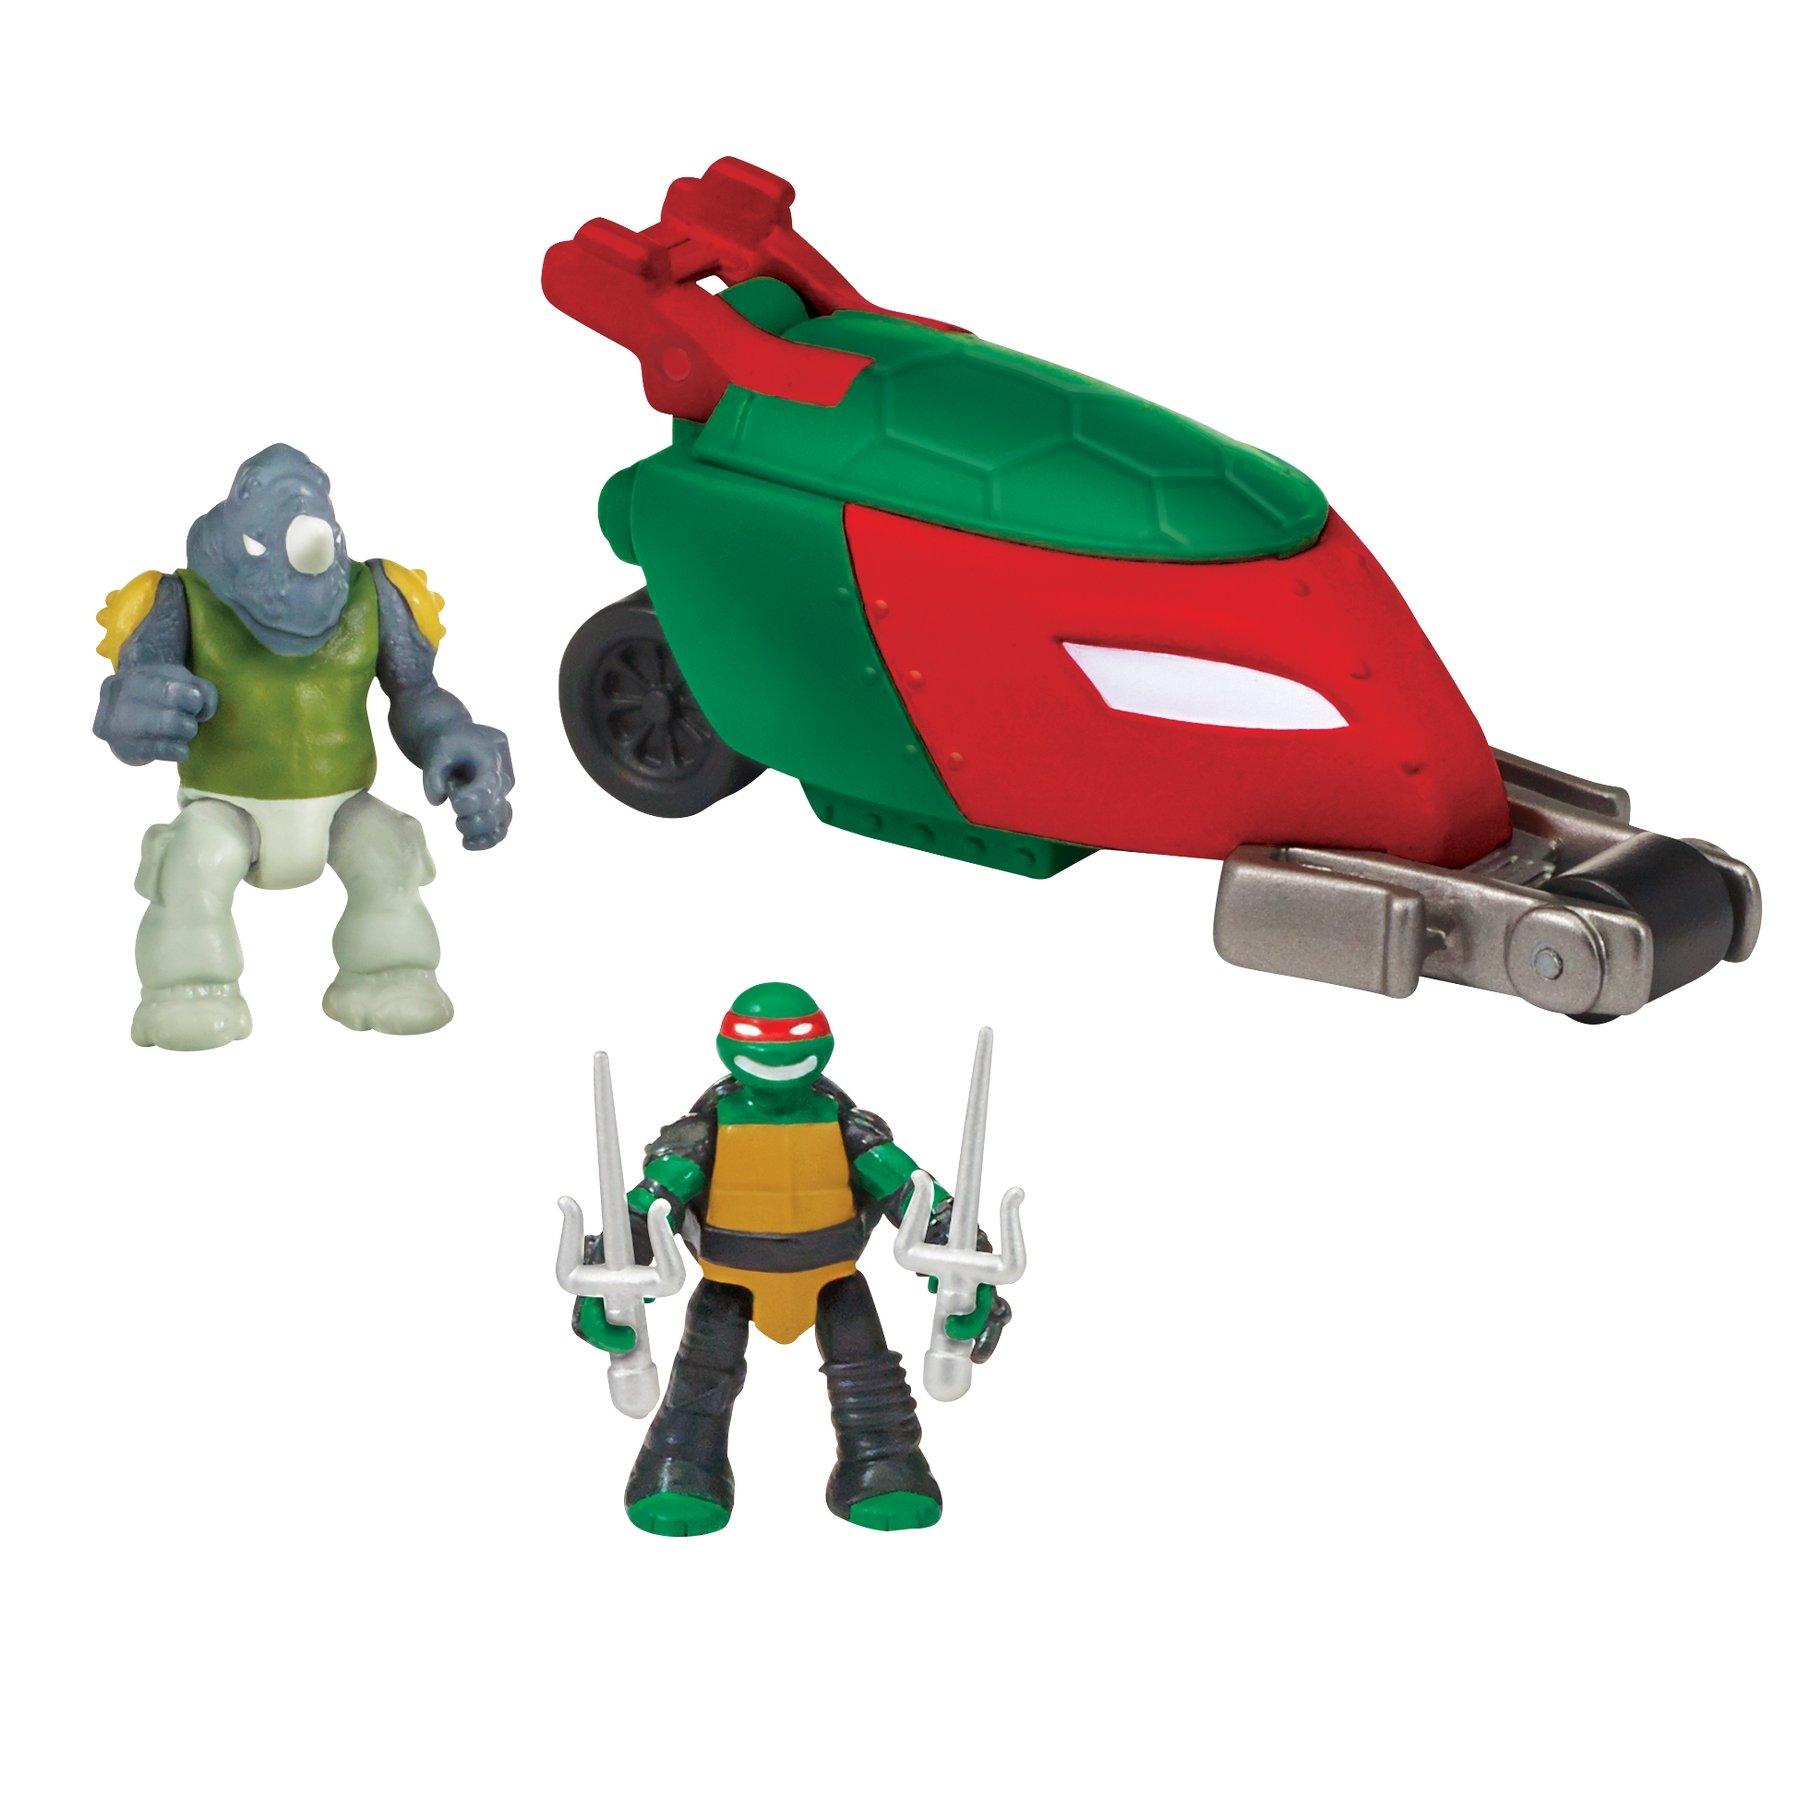 Teenage Mutant Ninja Turtles Micro Mutant Stealth Cycle with 1.15'' Scale Super Ninja Raphael and Rocksteady Figures and Vehicle